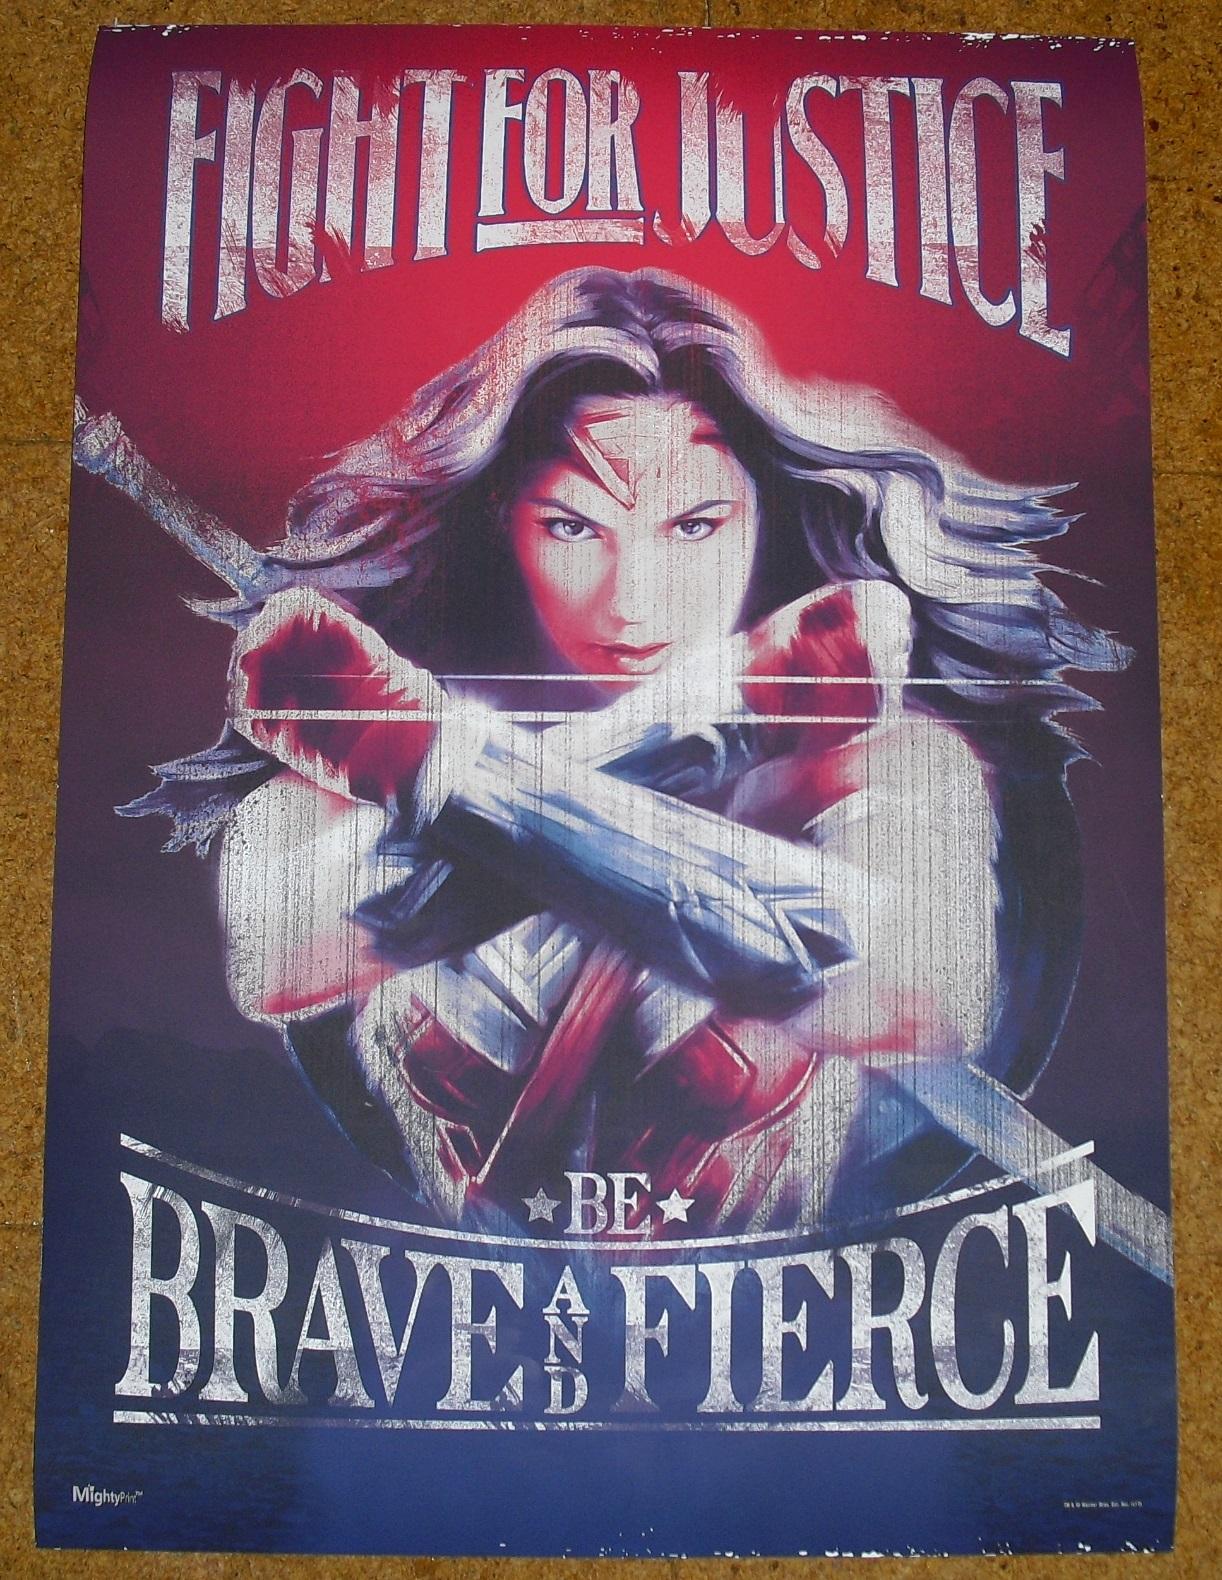 https://cld.pt/dl/download/6f607543-f64f-40cd-8aae-9d23b0c56bfd/Wonder.Woman.Poster.JPG